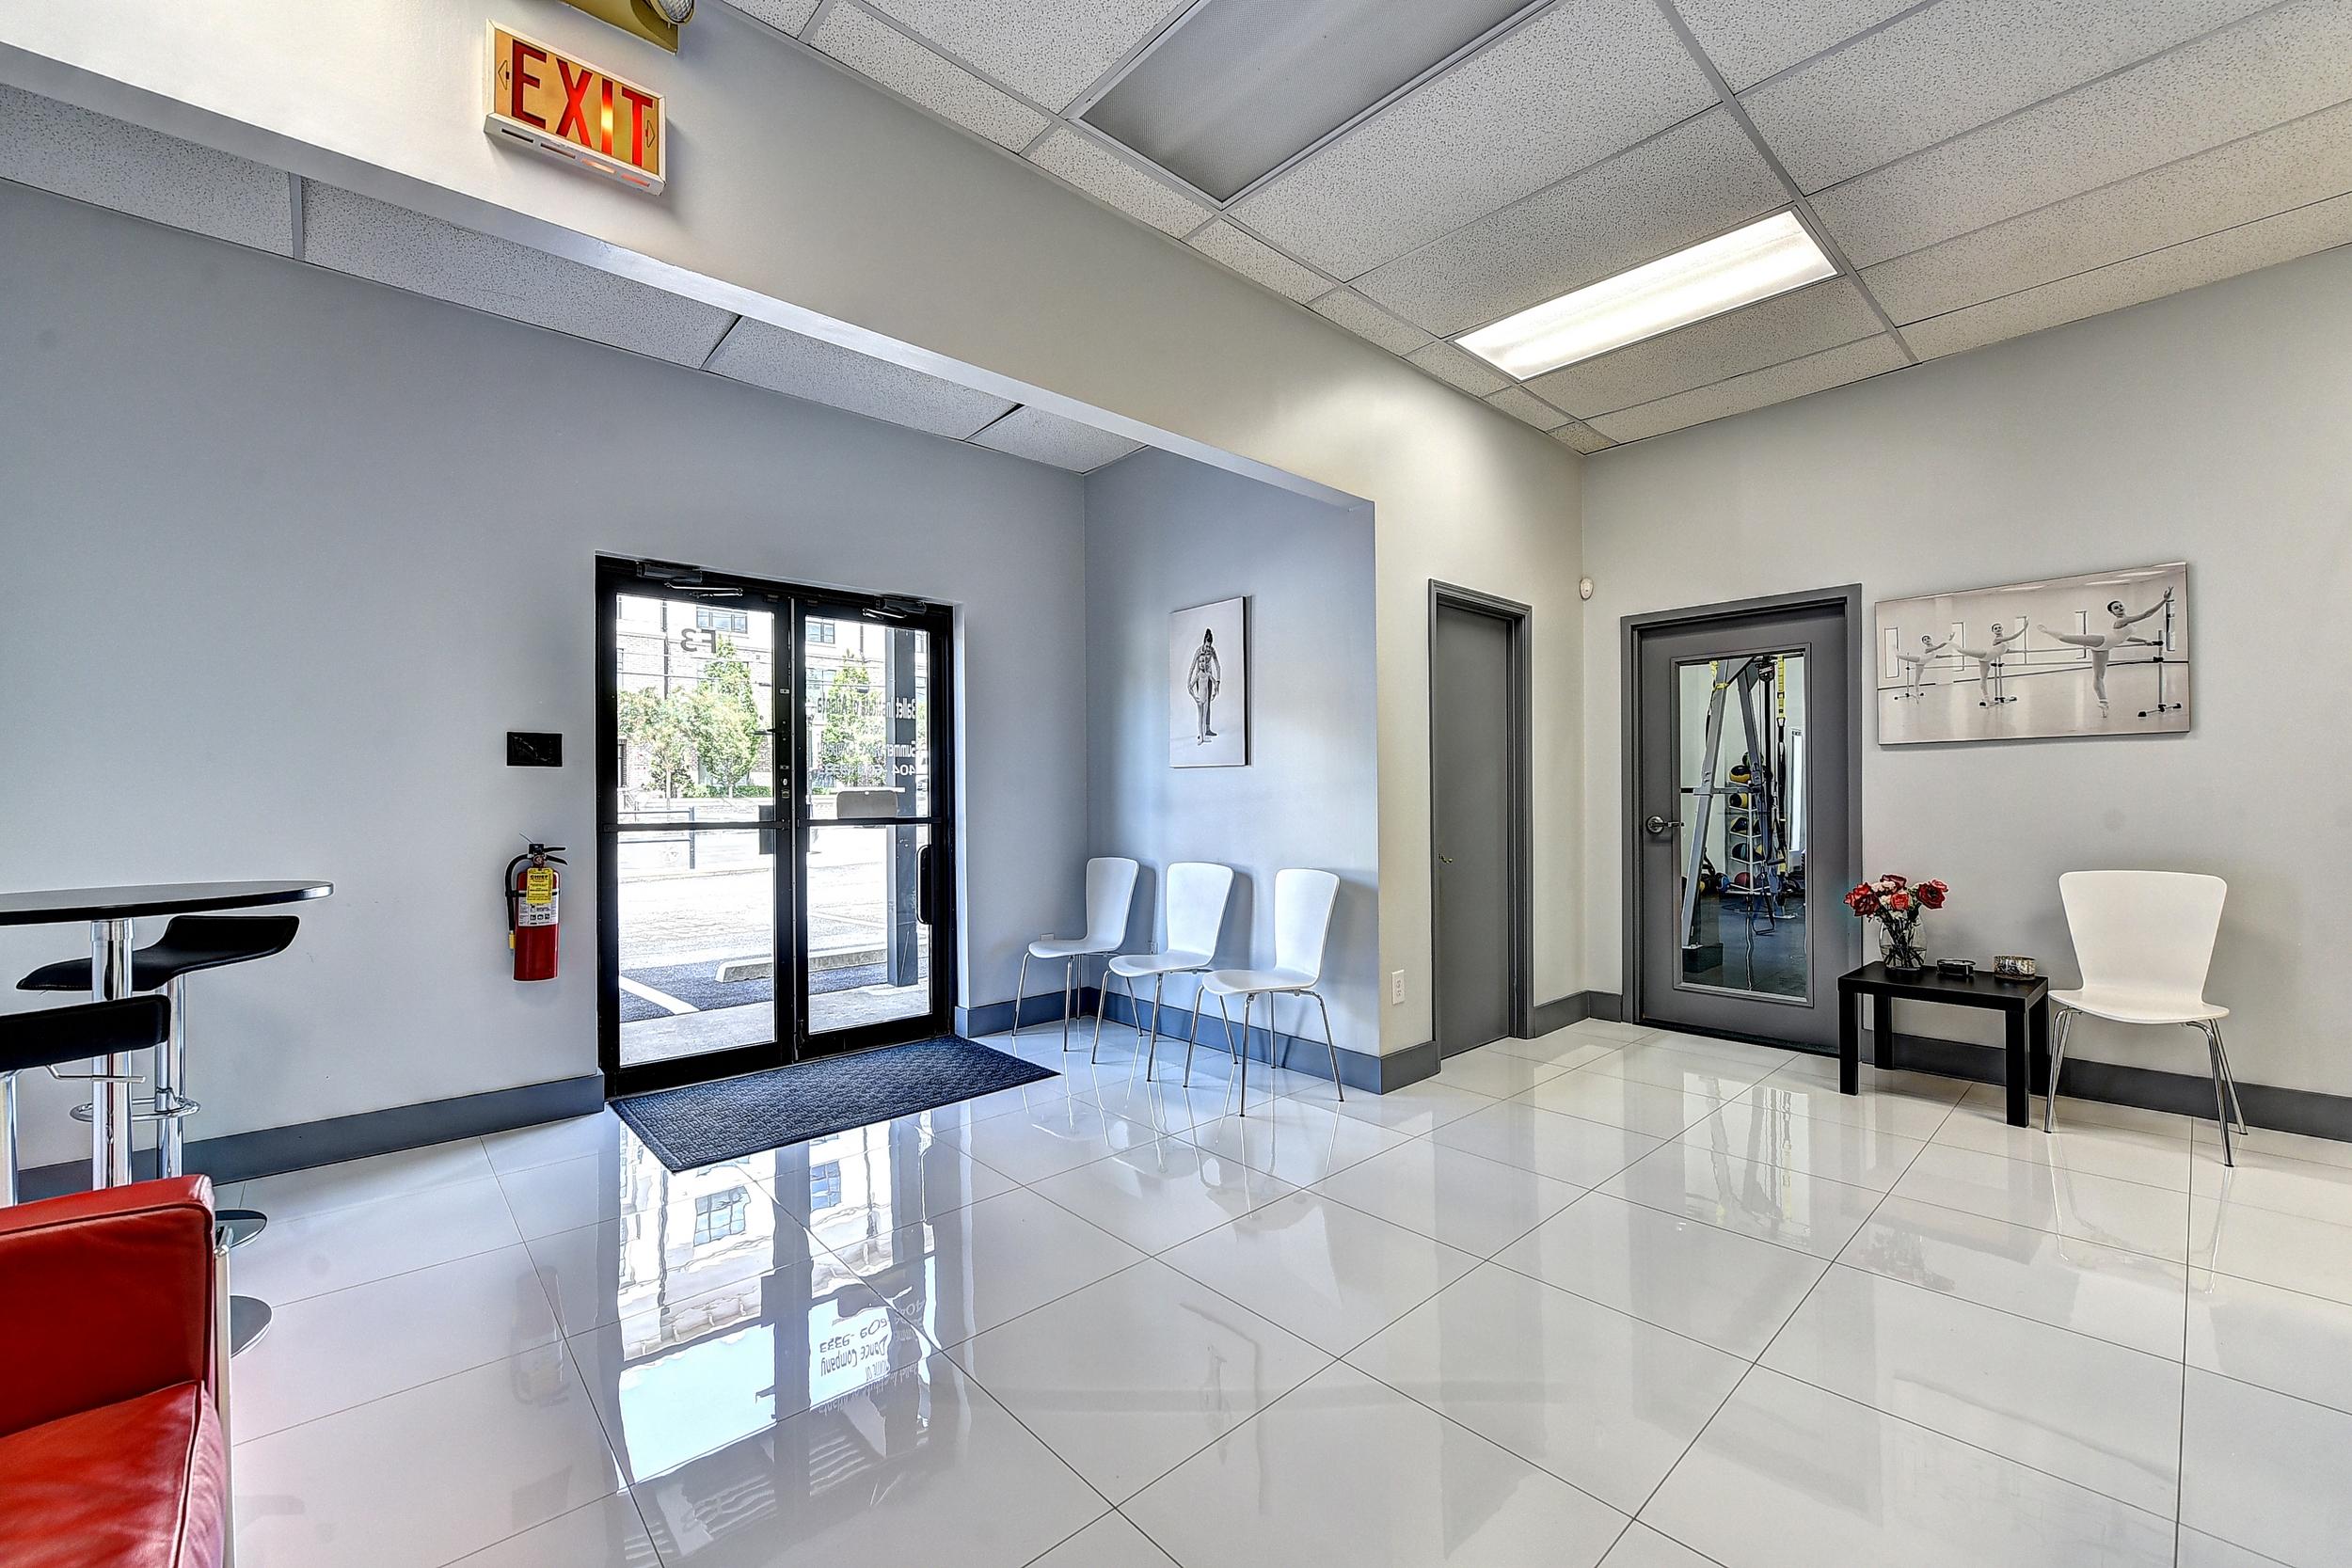 BIA Lobby 2